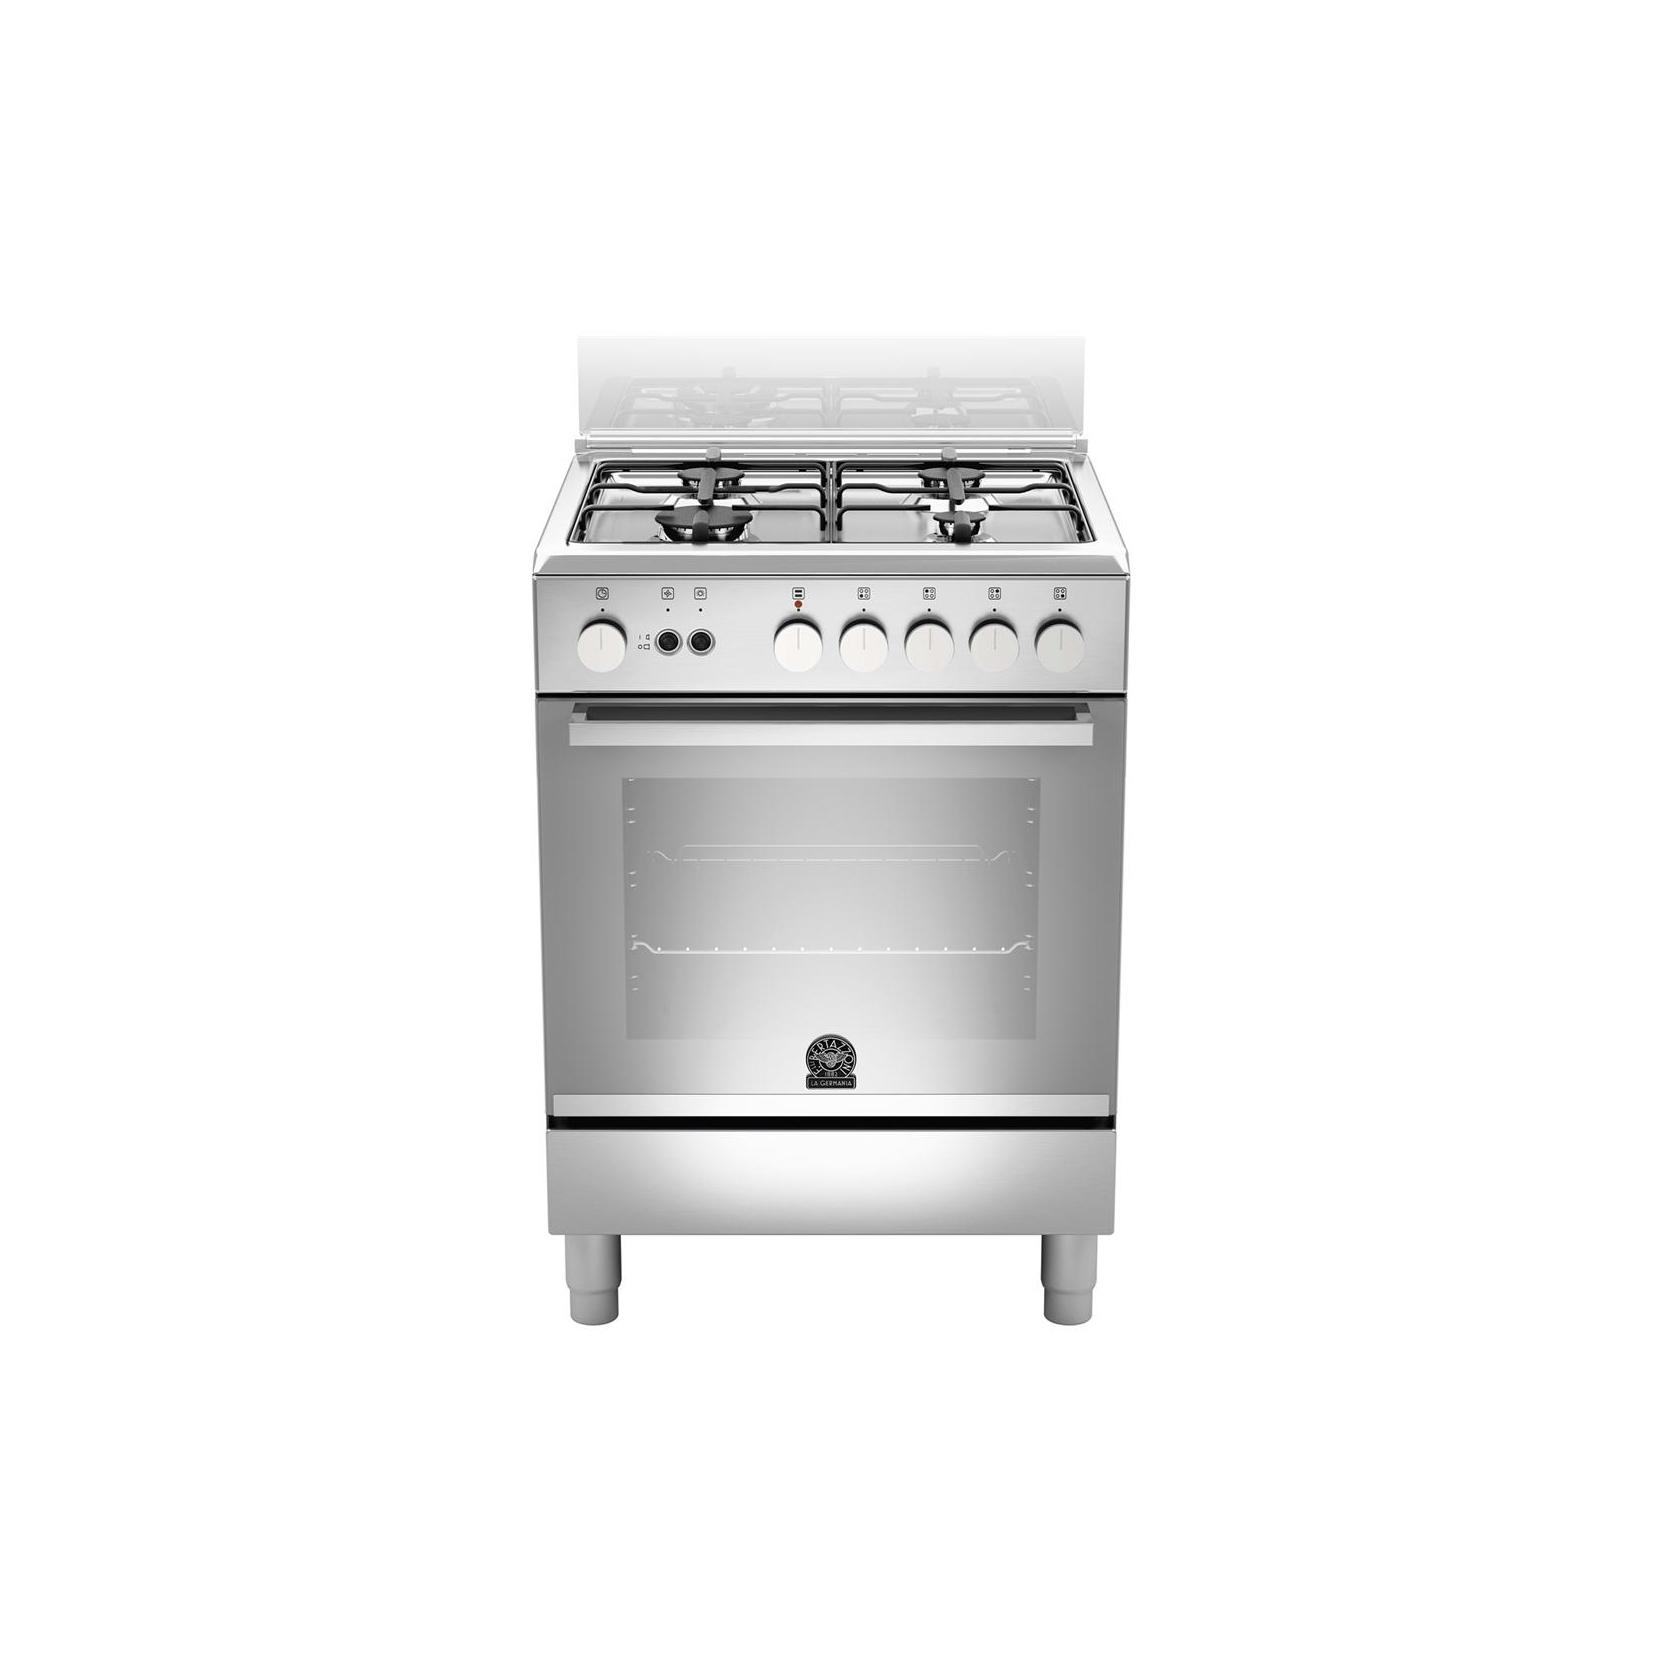 Cucina la germania tu64071dx 60x60 4 fuochi a gas forno gas ventilato colore inox garanzia - Cucine a gas samsung ...